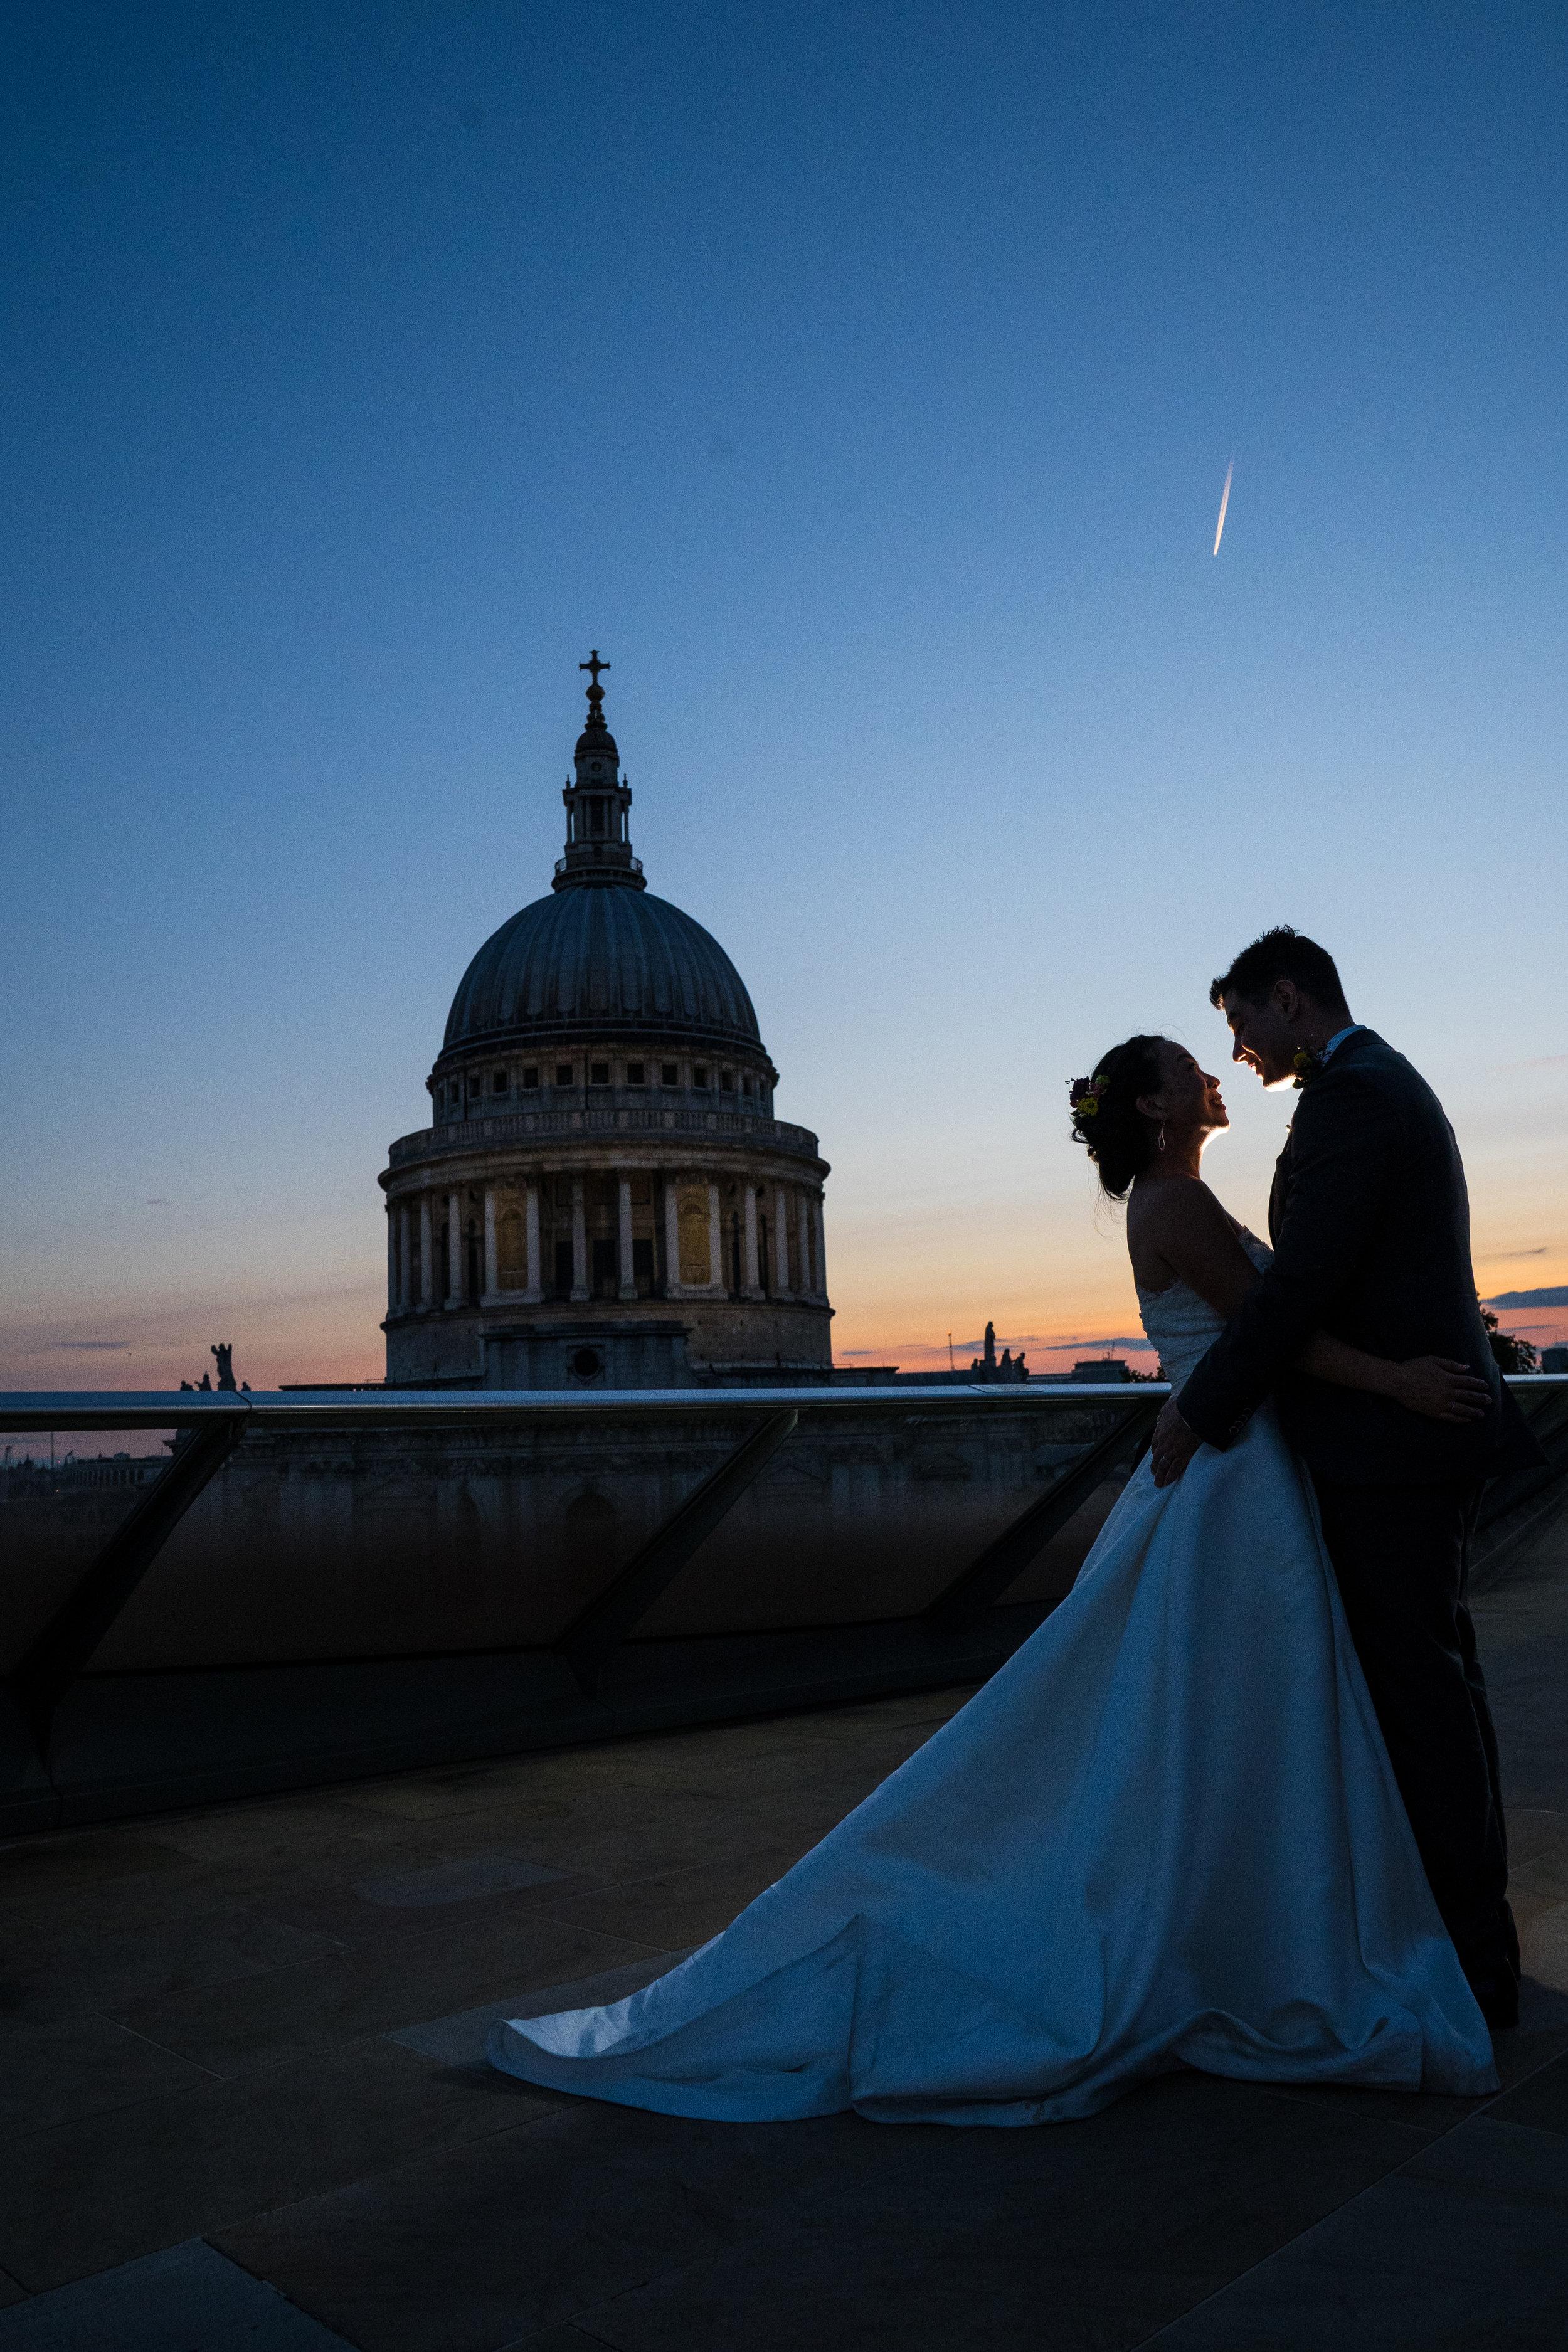 river-rooms-tower-bridge-london-stpauls-mondrian-hotel-wedding-photography-videography-77